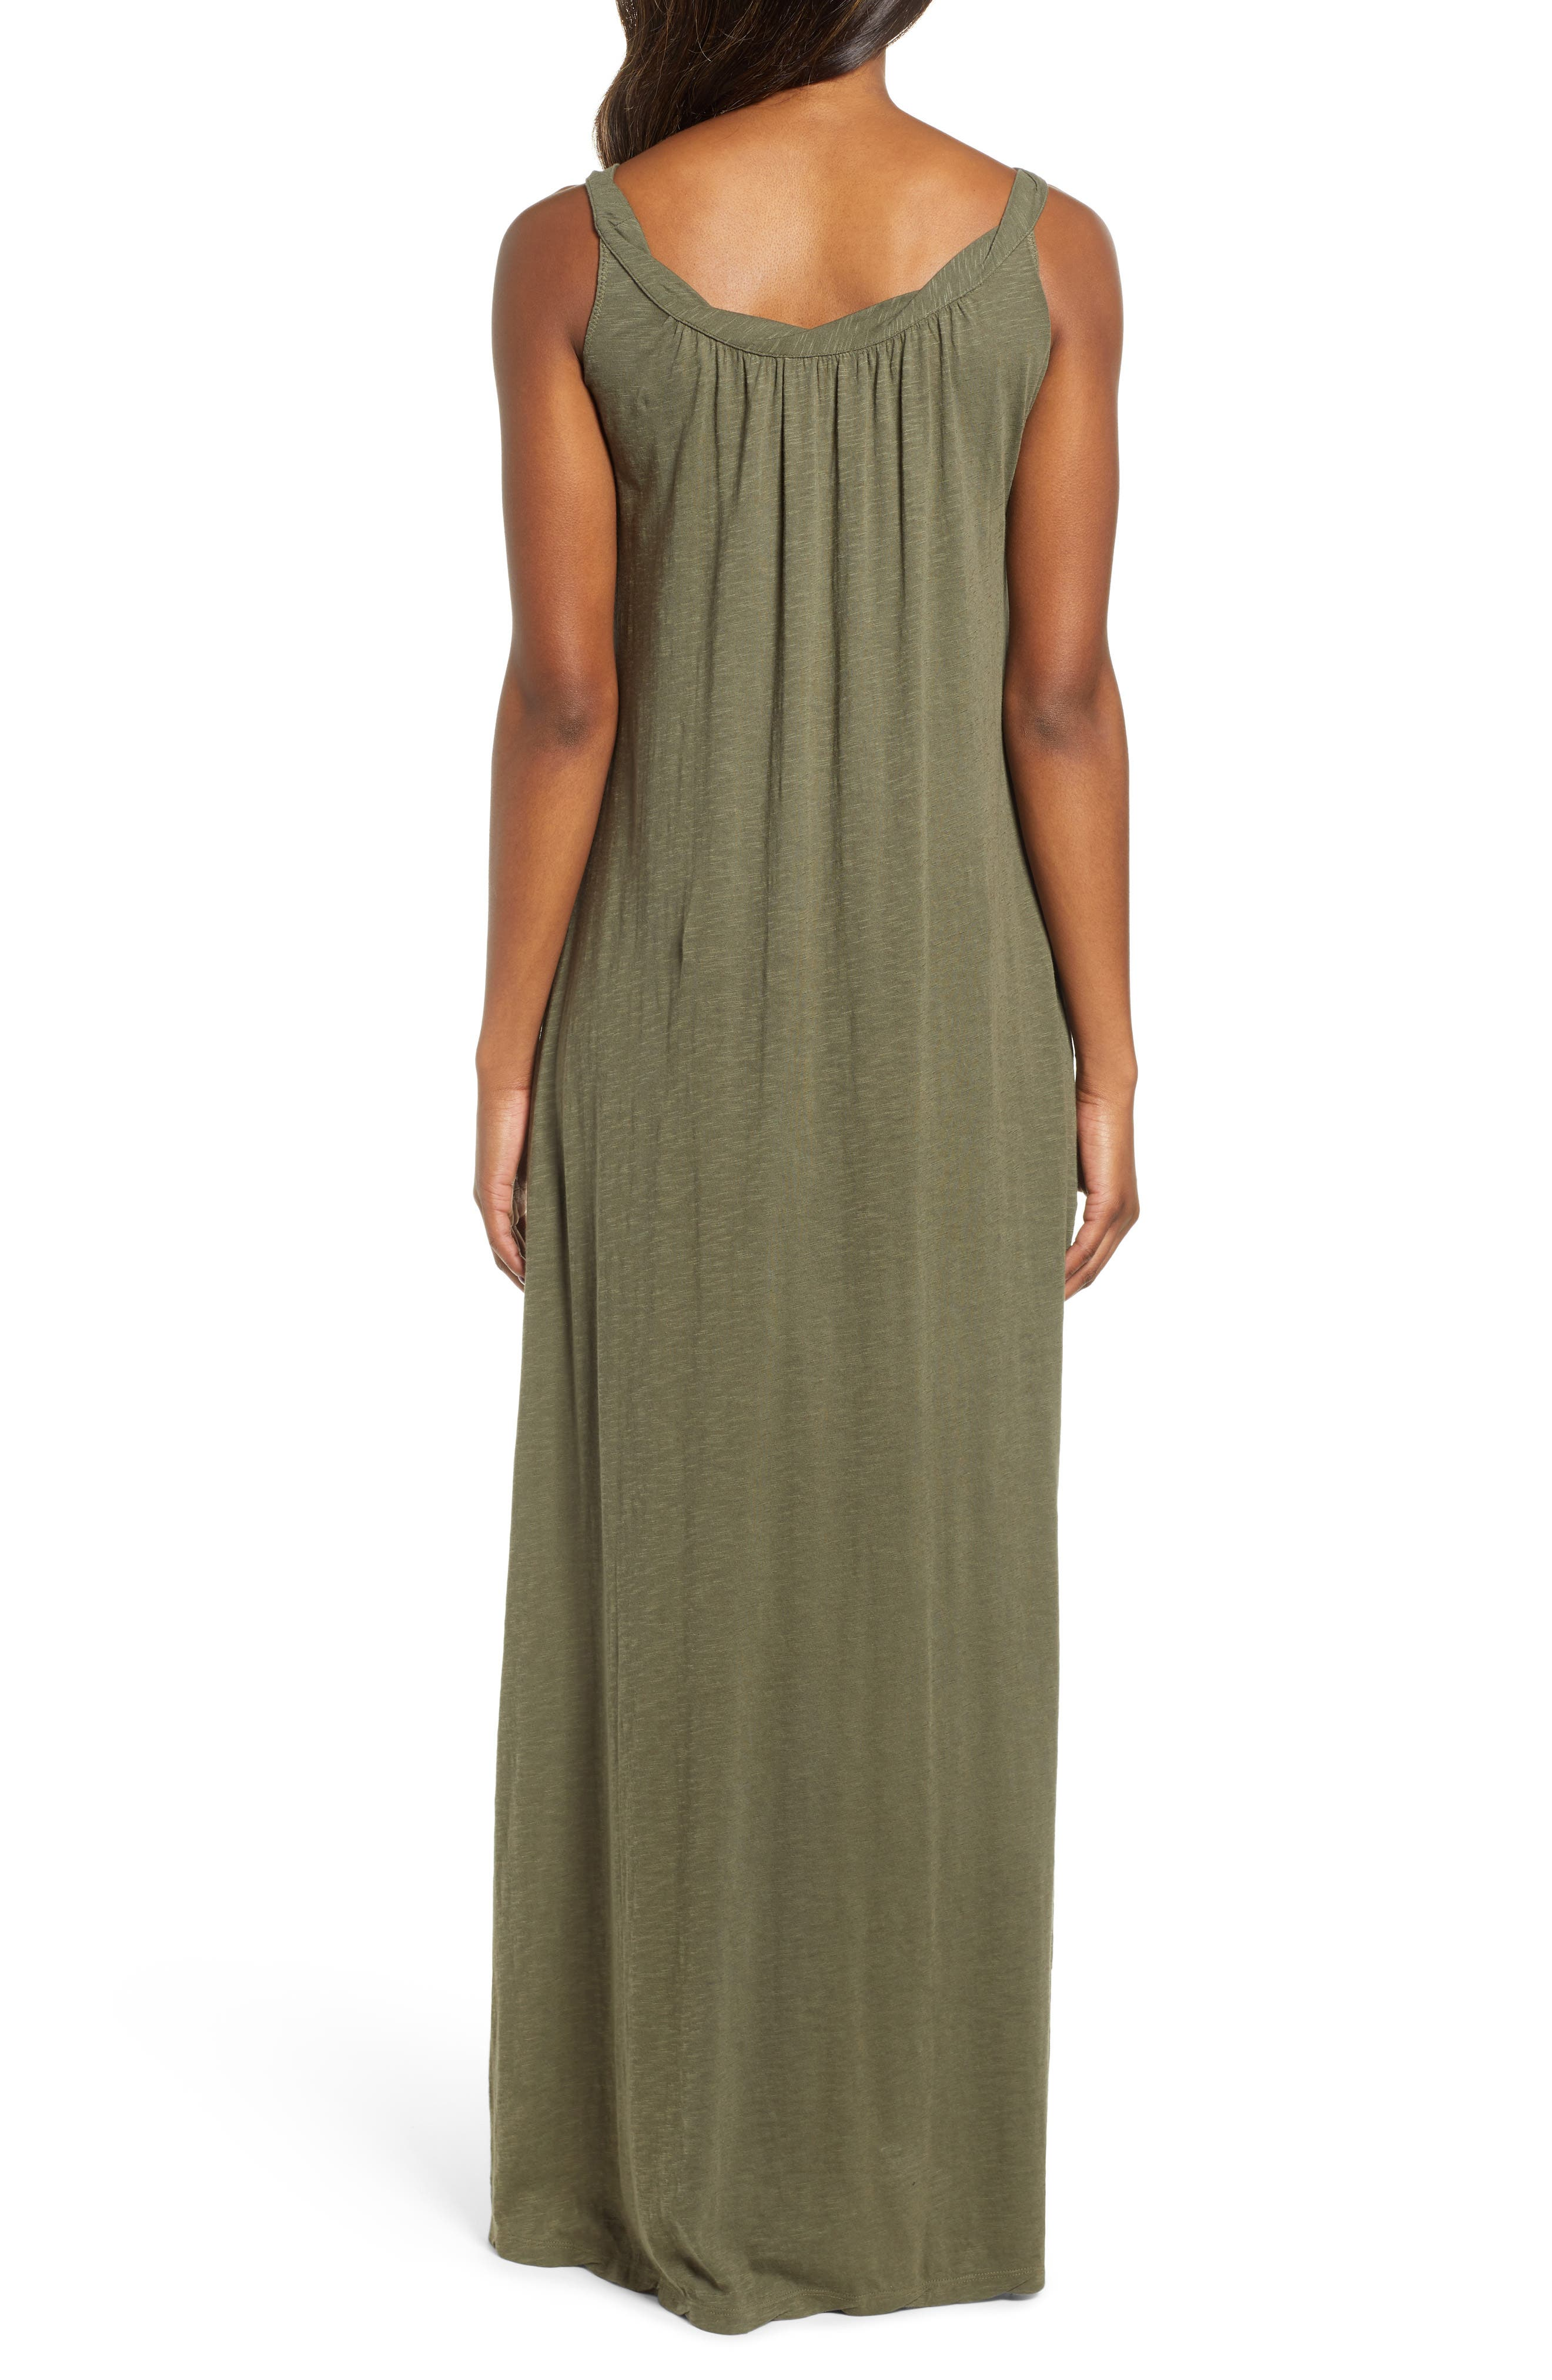 674fba24 Women's Sale Dresses | Nordstrom